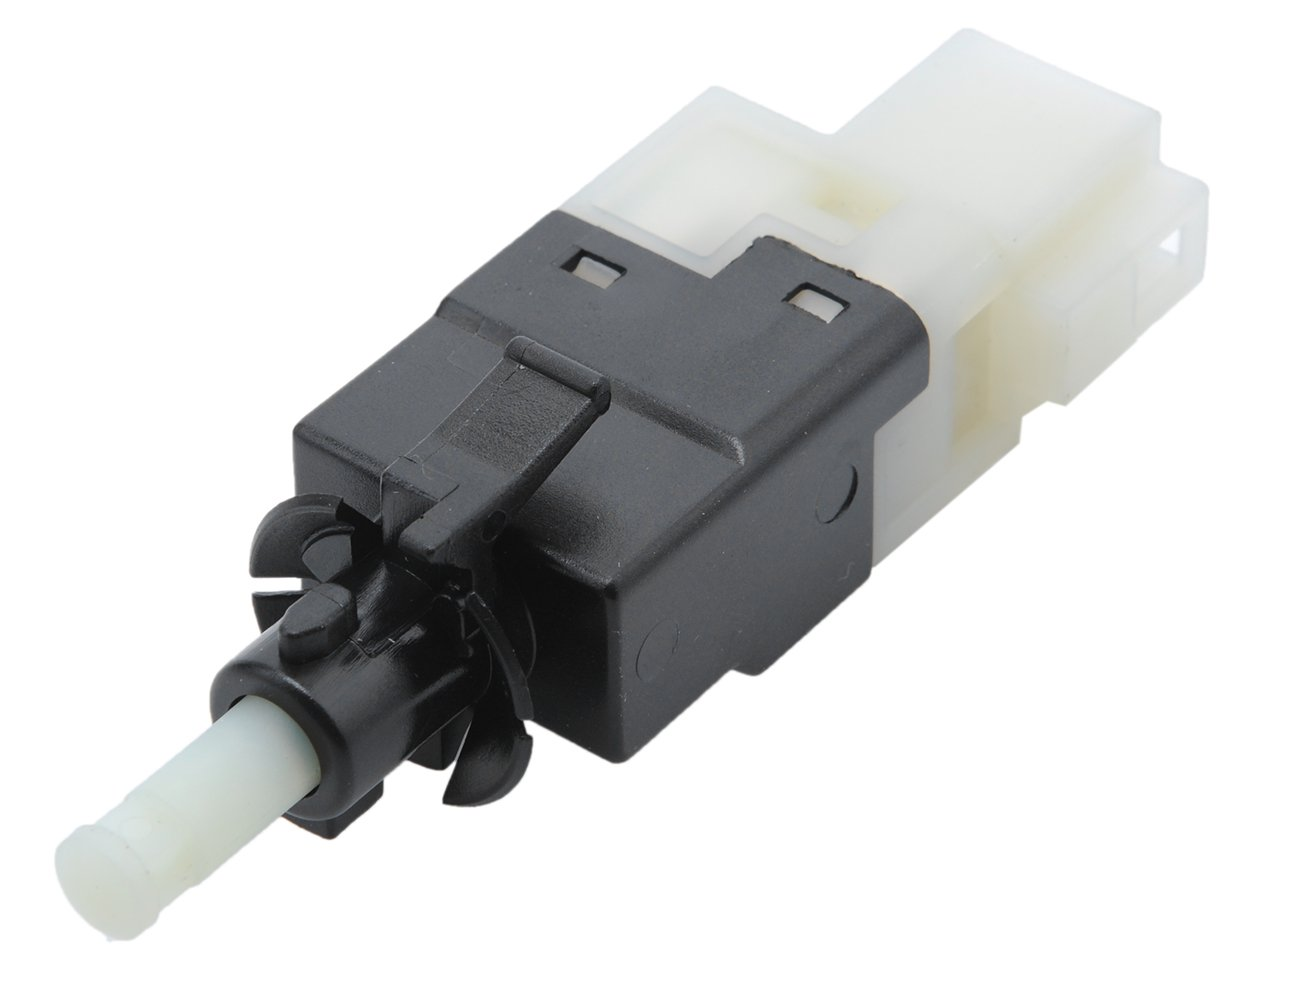 Bapmic 0015453809 Brake Stop Light Switch for Mercedes Benz W203 C320 C230 C240 C280 01-07